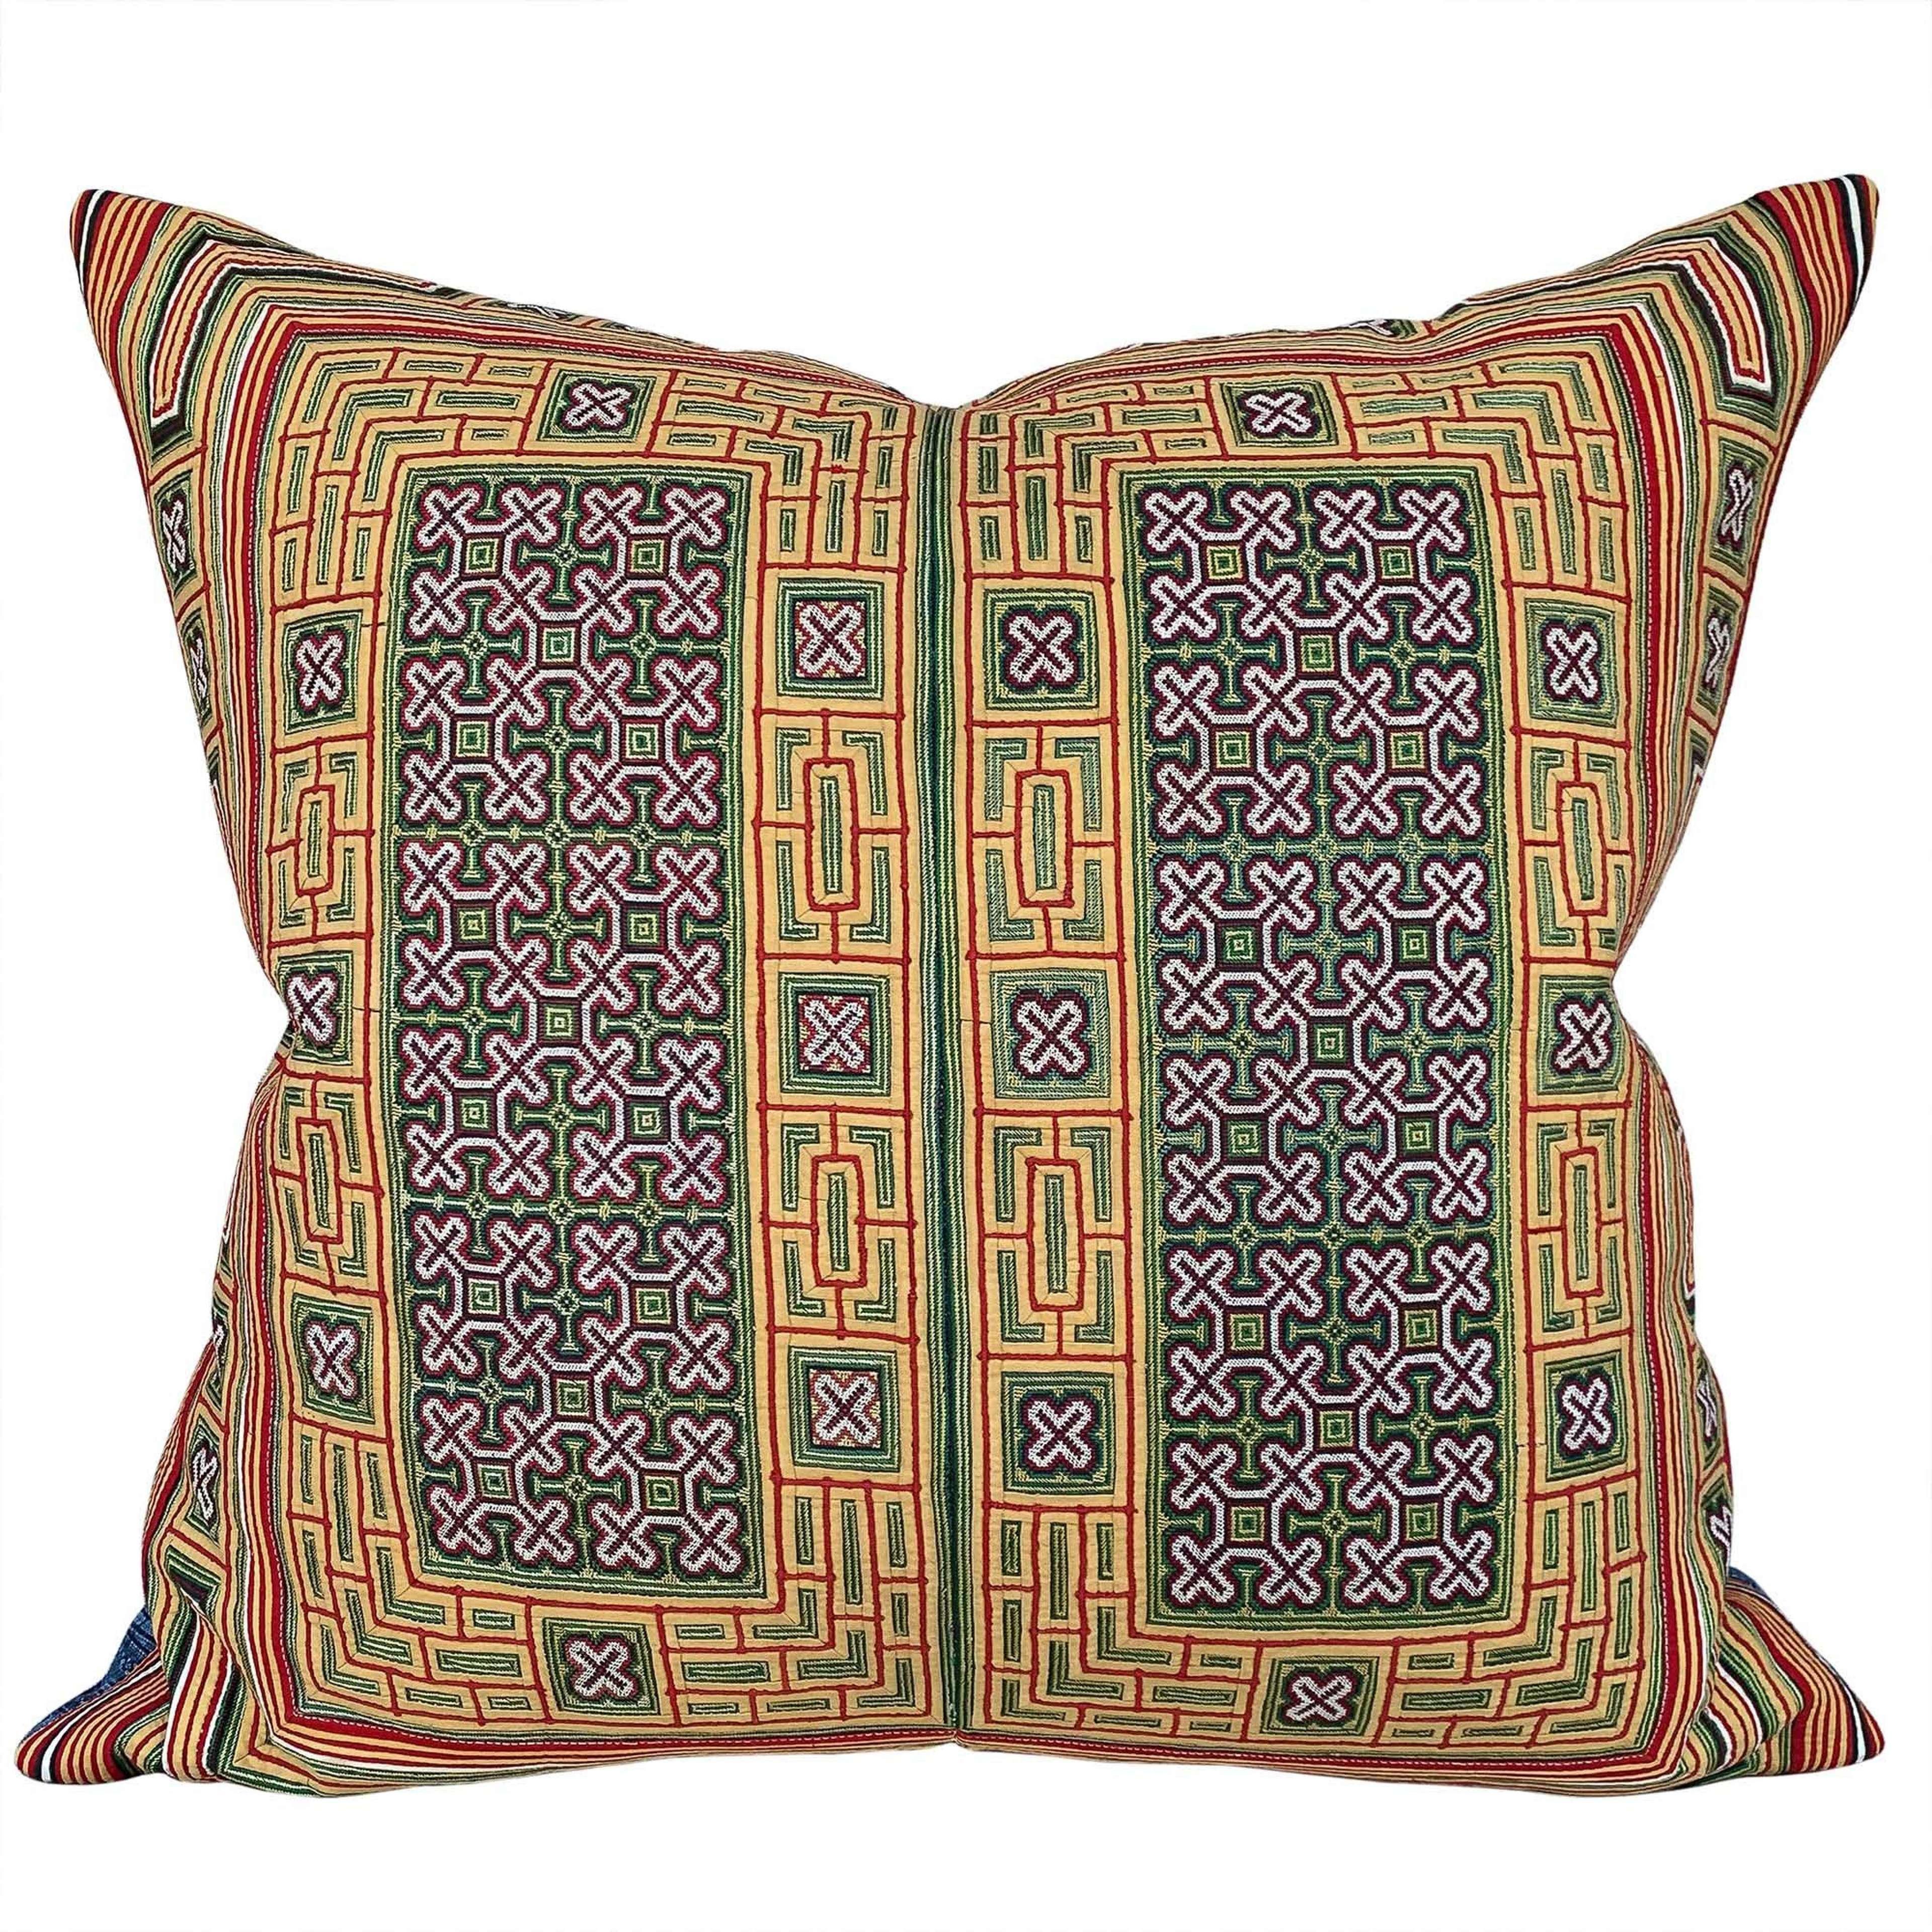 Miao collar cushion